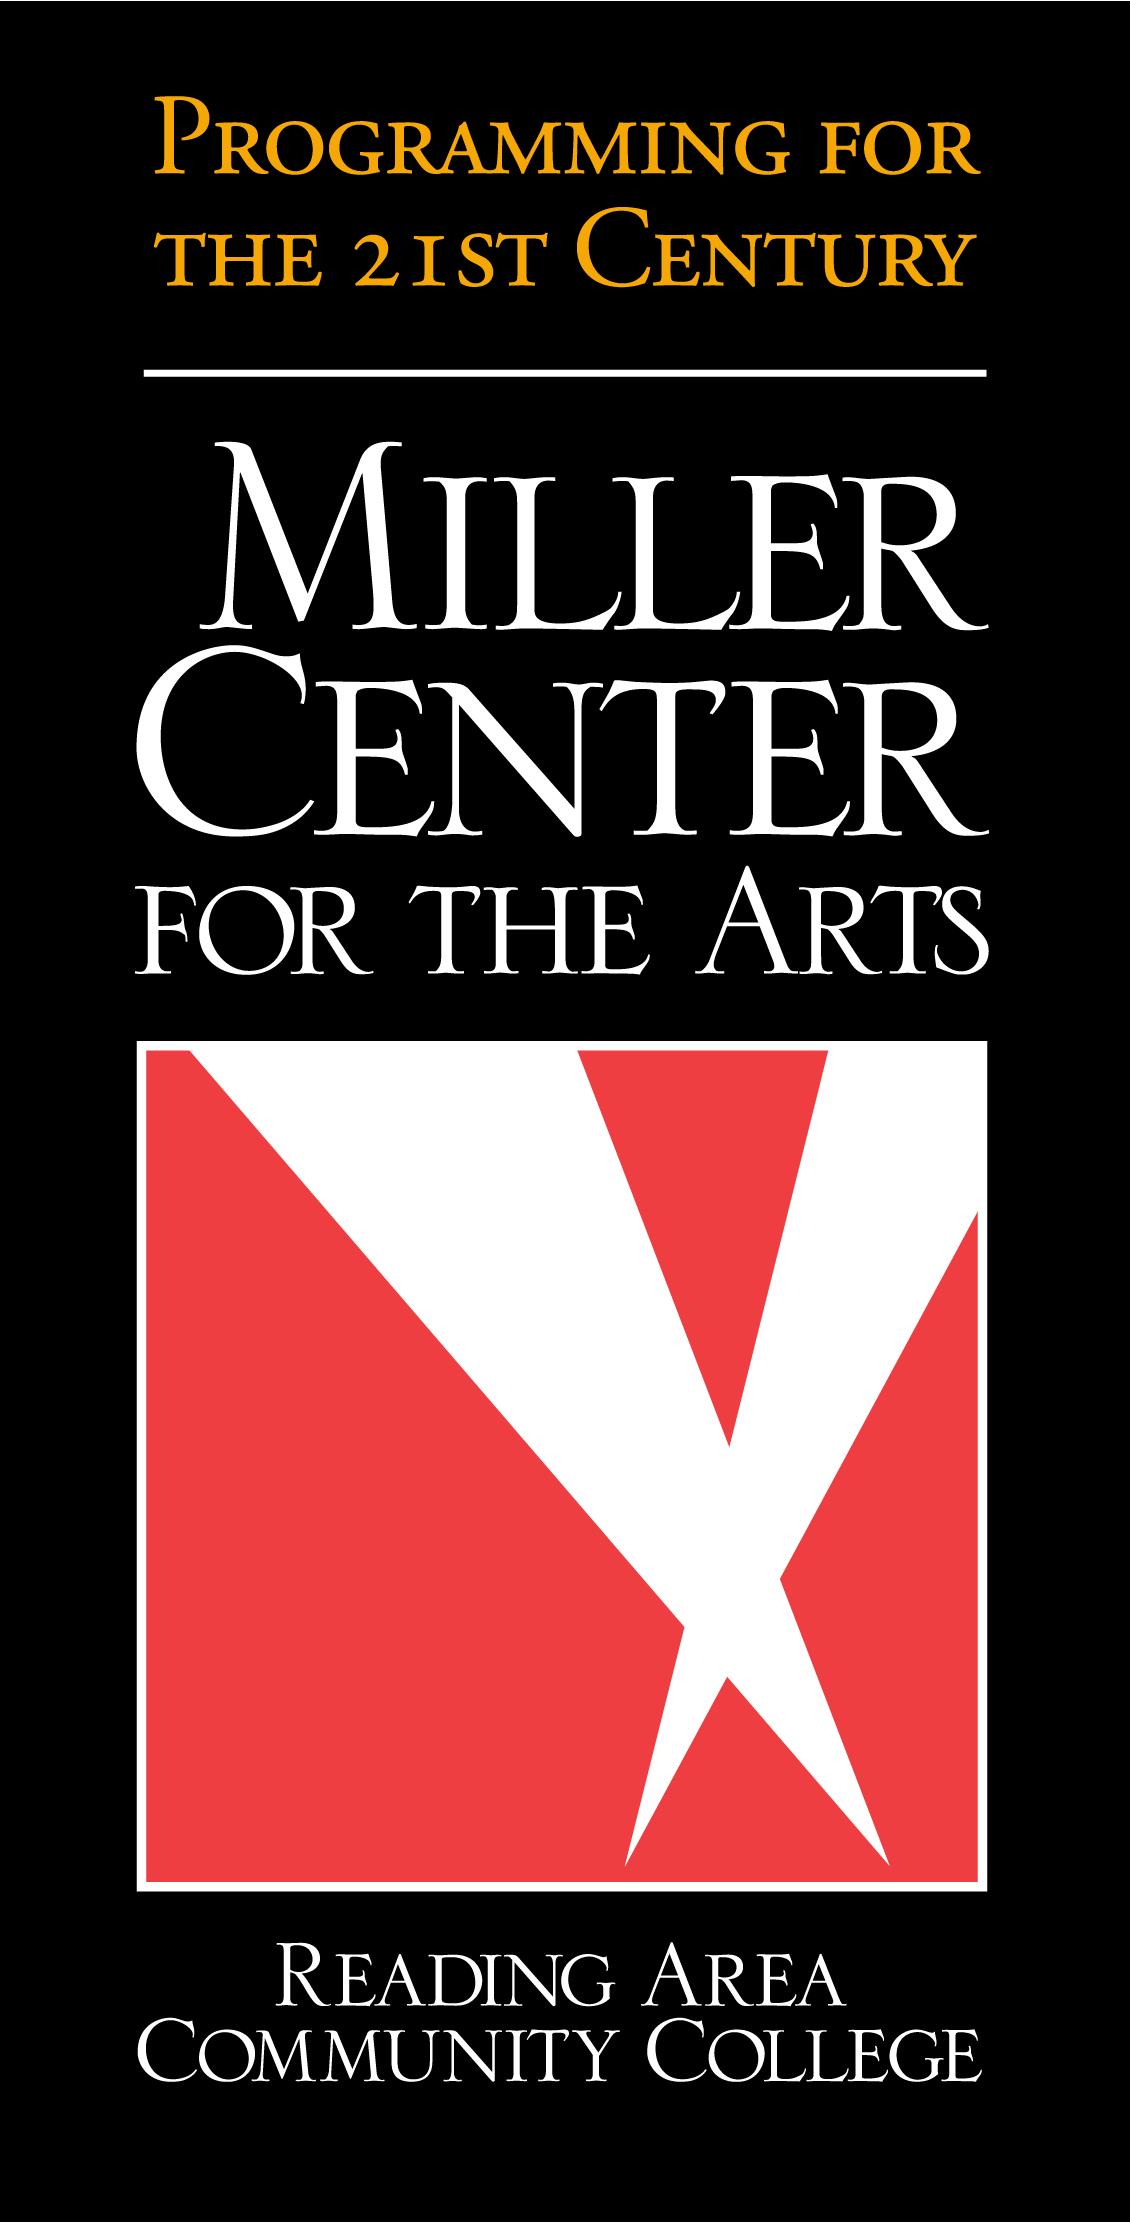 Miller Center for the Arts